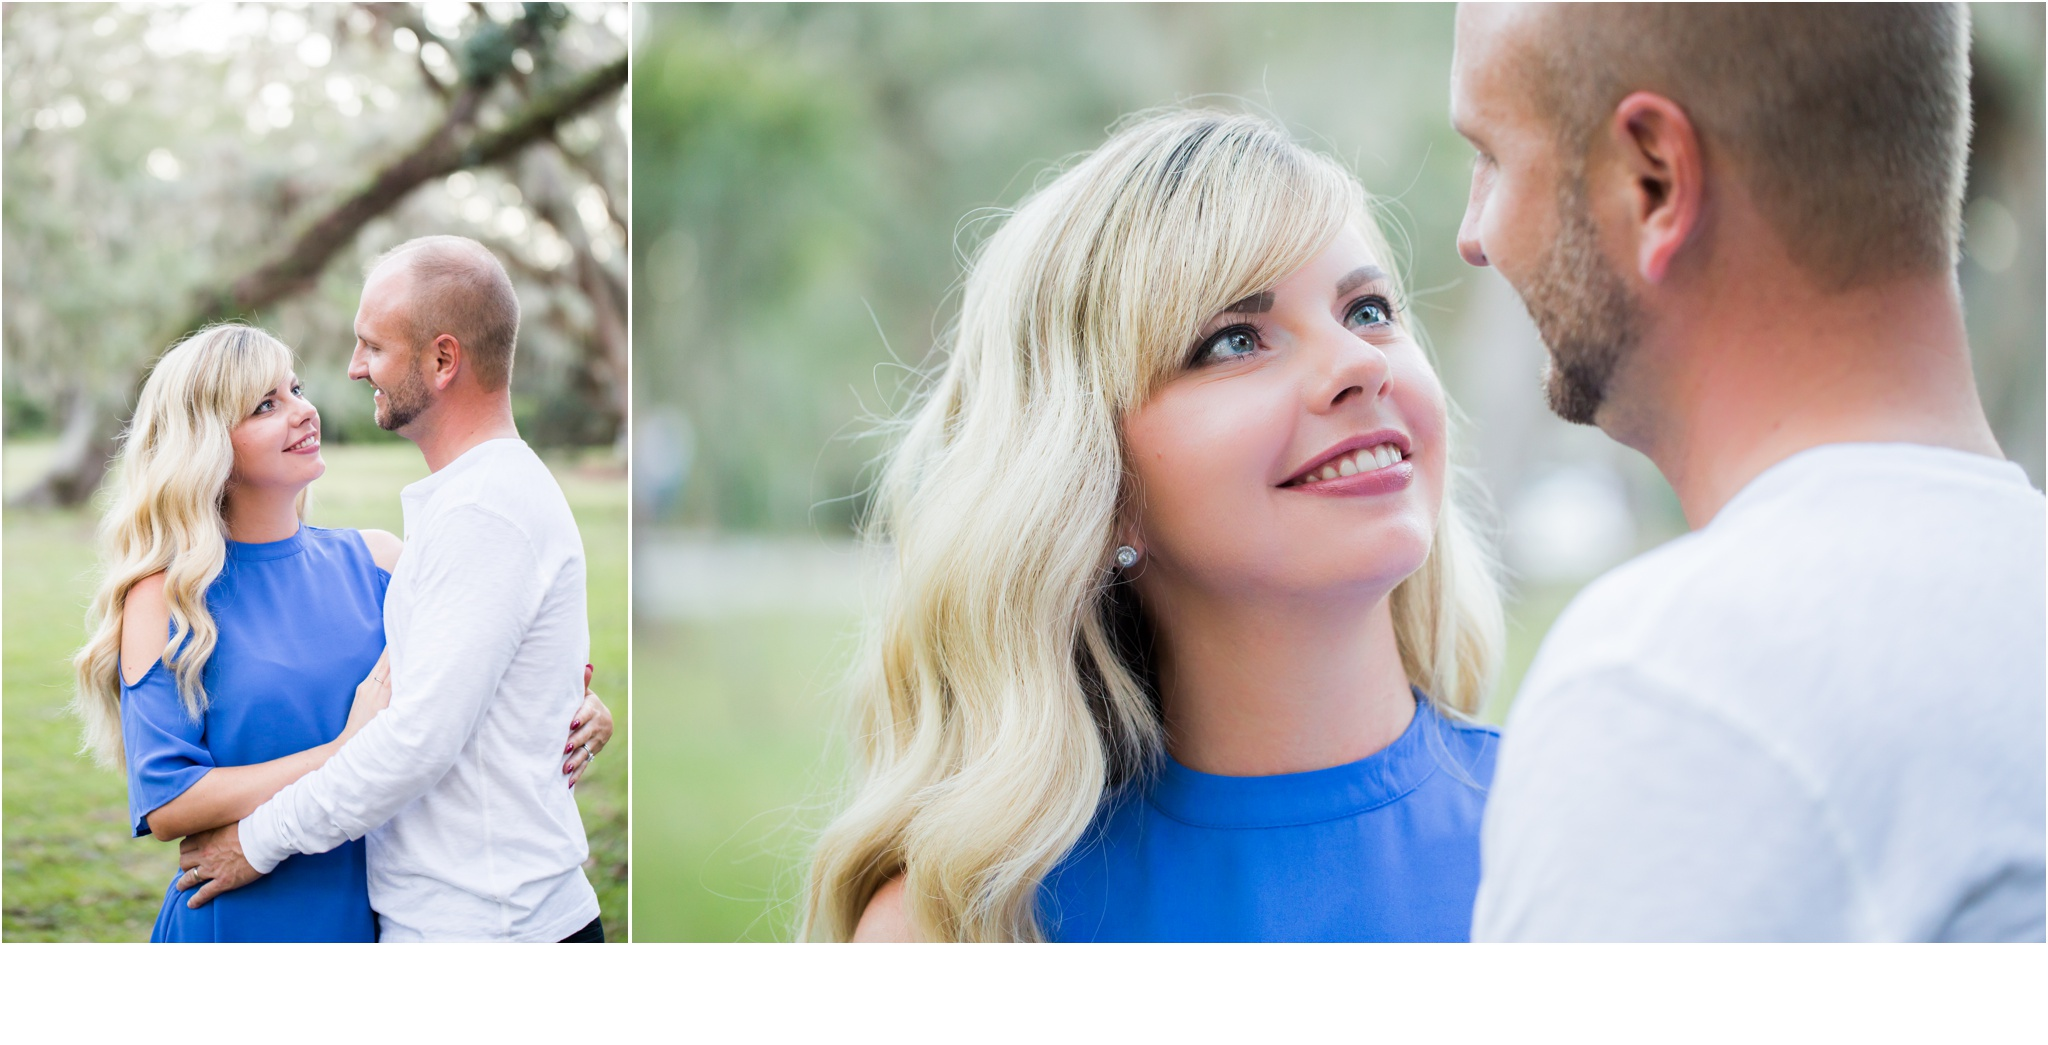 Rainey_Gregg_Photography_St._Simons_Island_Georgia_California_Wedding_Portrait_Photography_0262.jpg